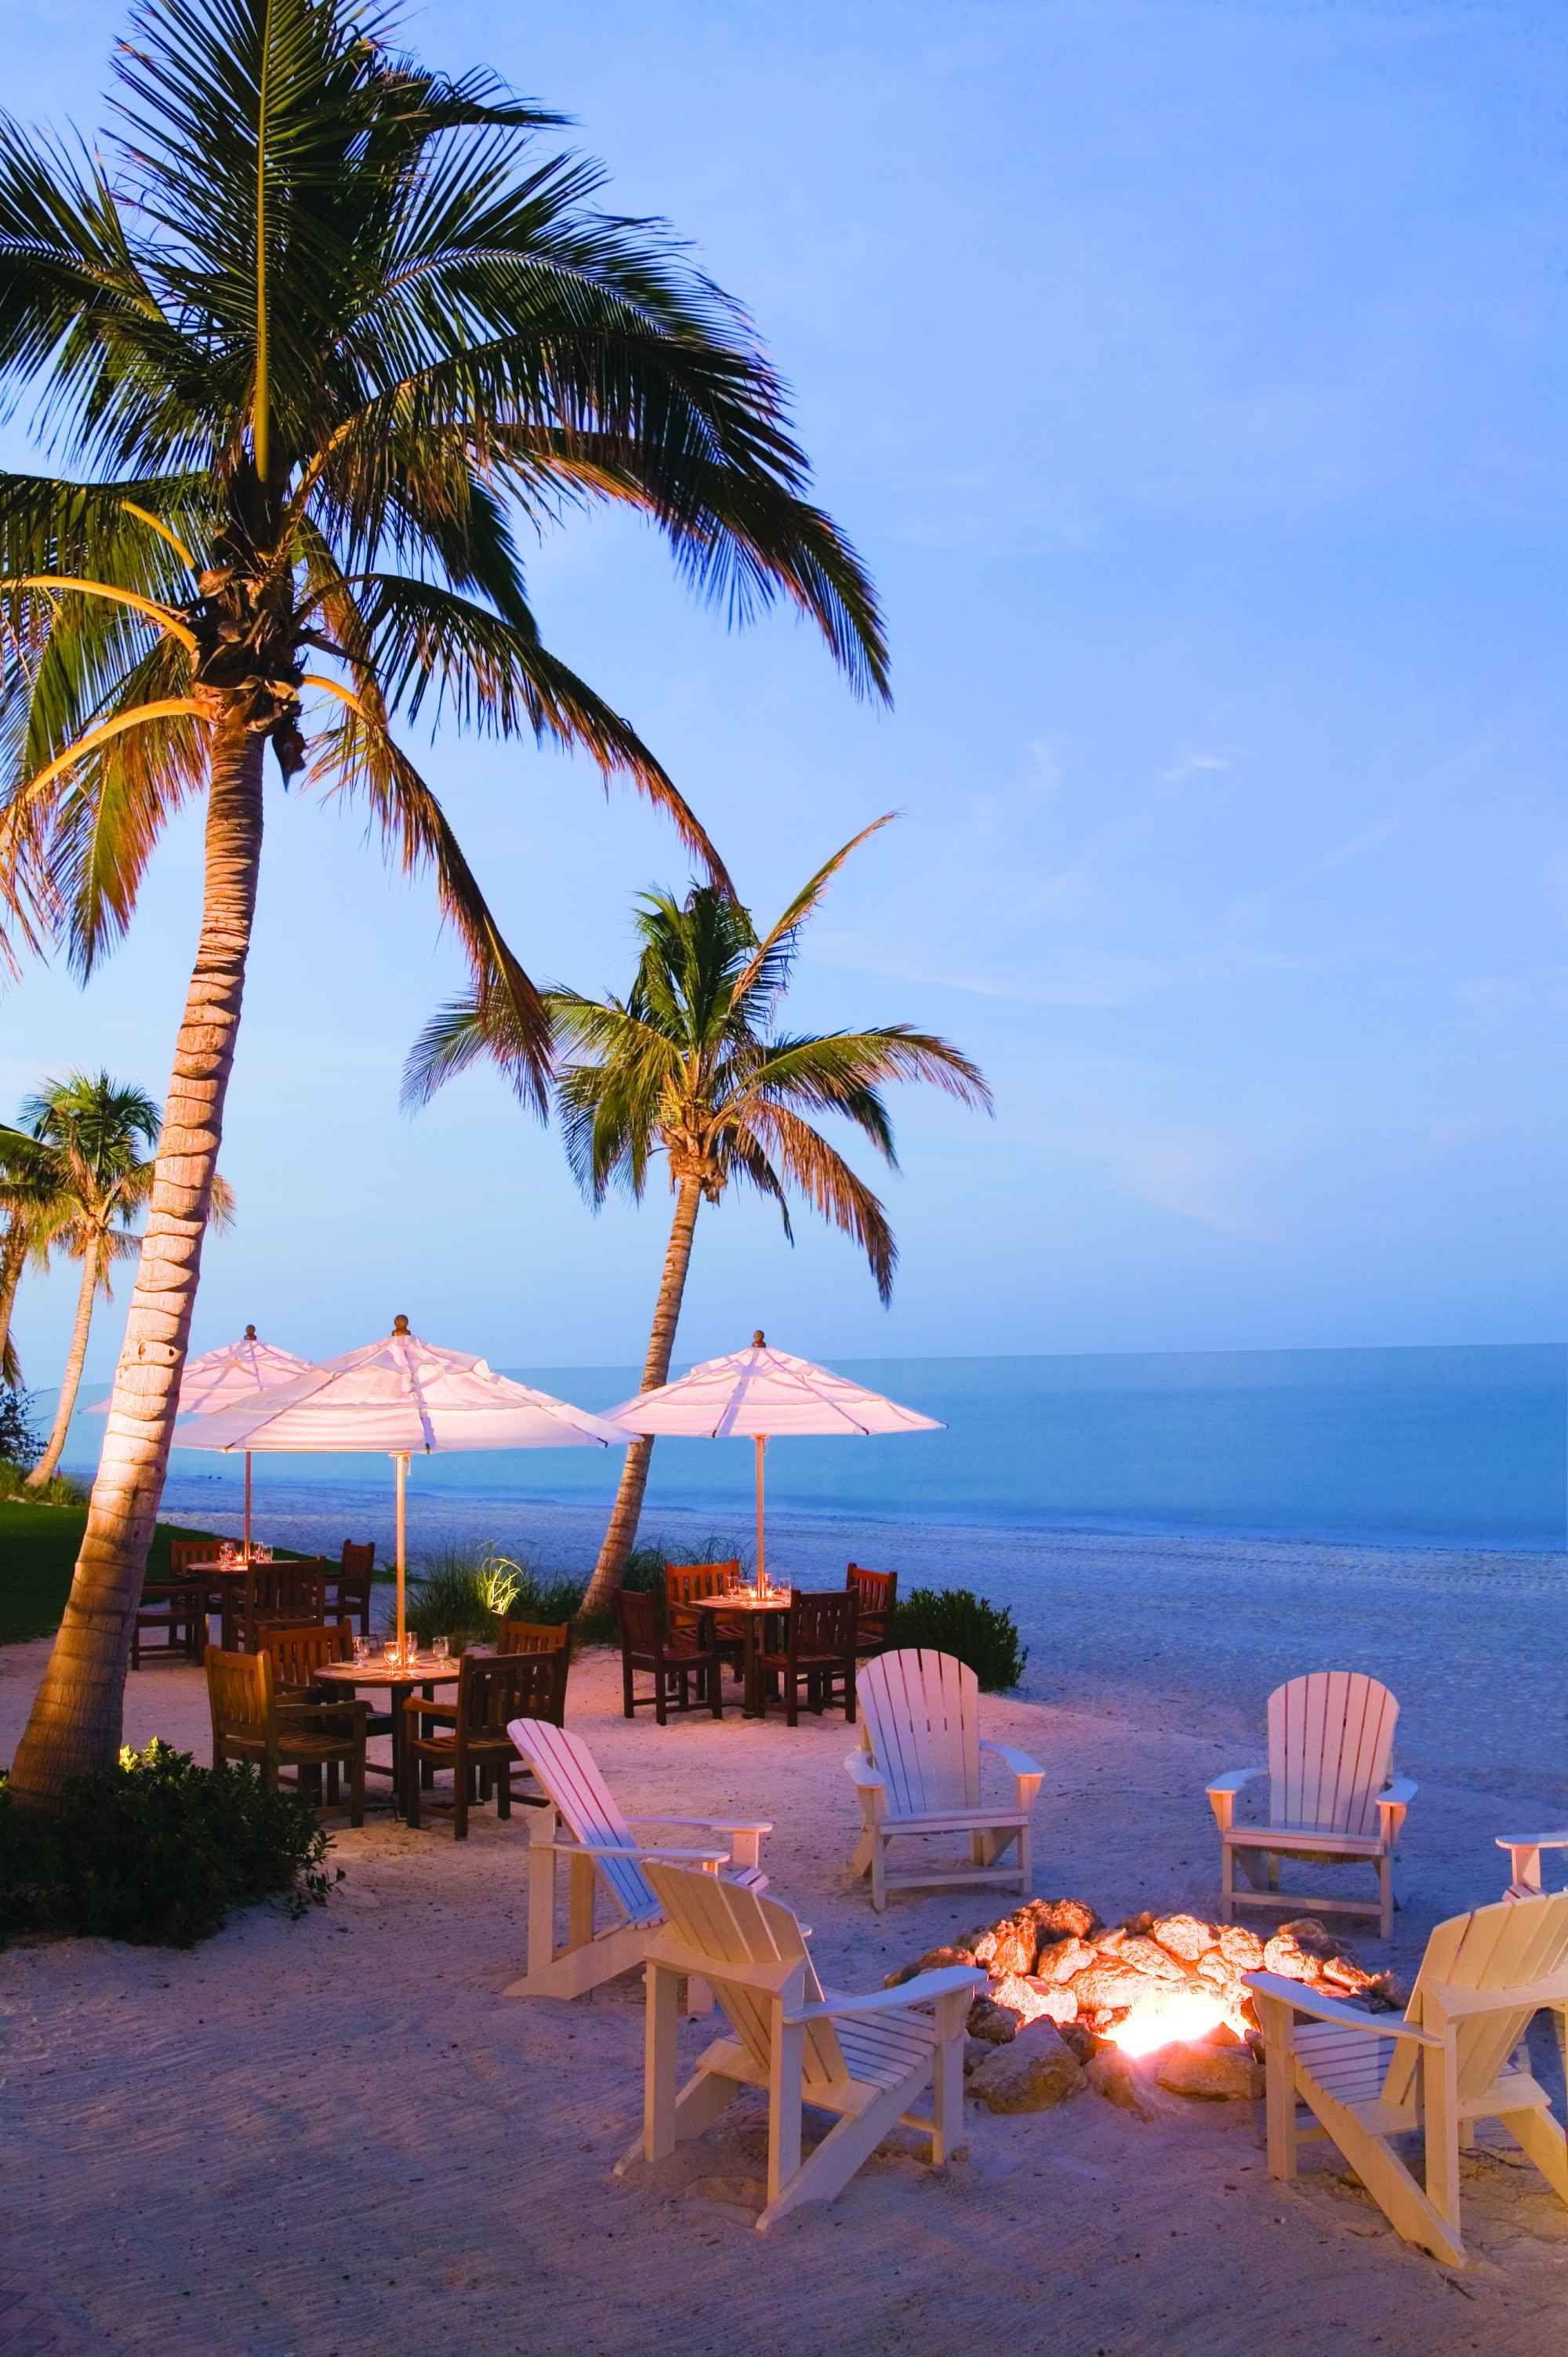 10 Most Romantic Honeymoon Resorts In The U S Best Places To Honeymoon Beach Honeymoon Destinations Best Honeymoon Destinations